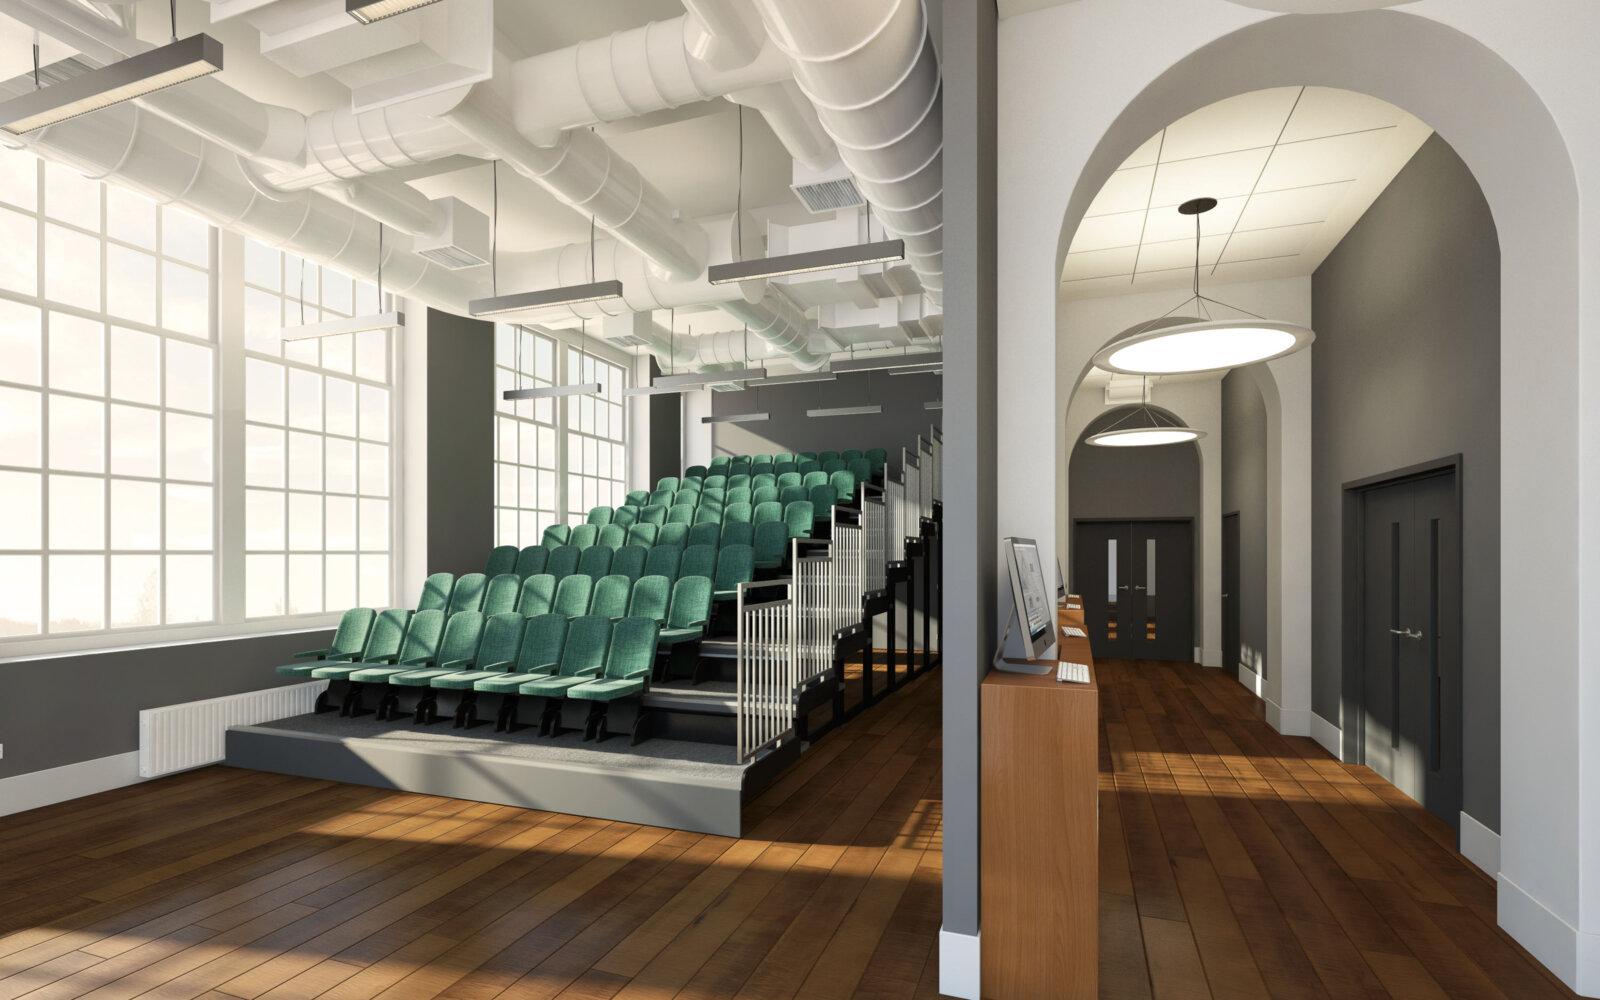 School of Fine Art University of Leeds lecture theatre CGI